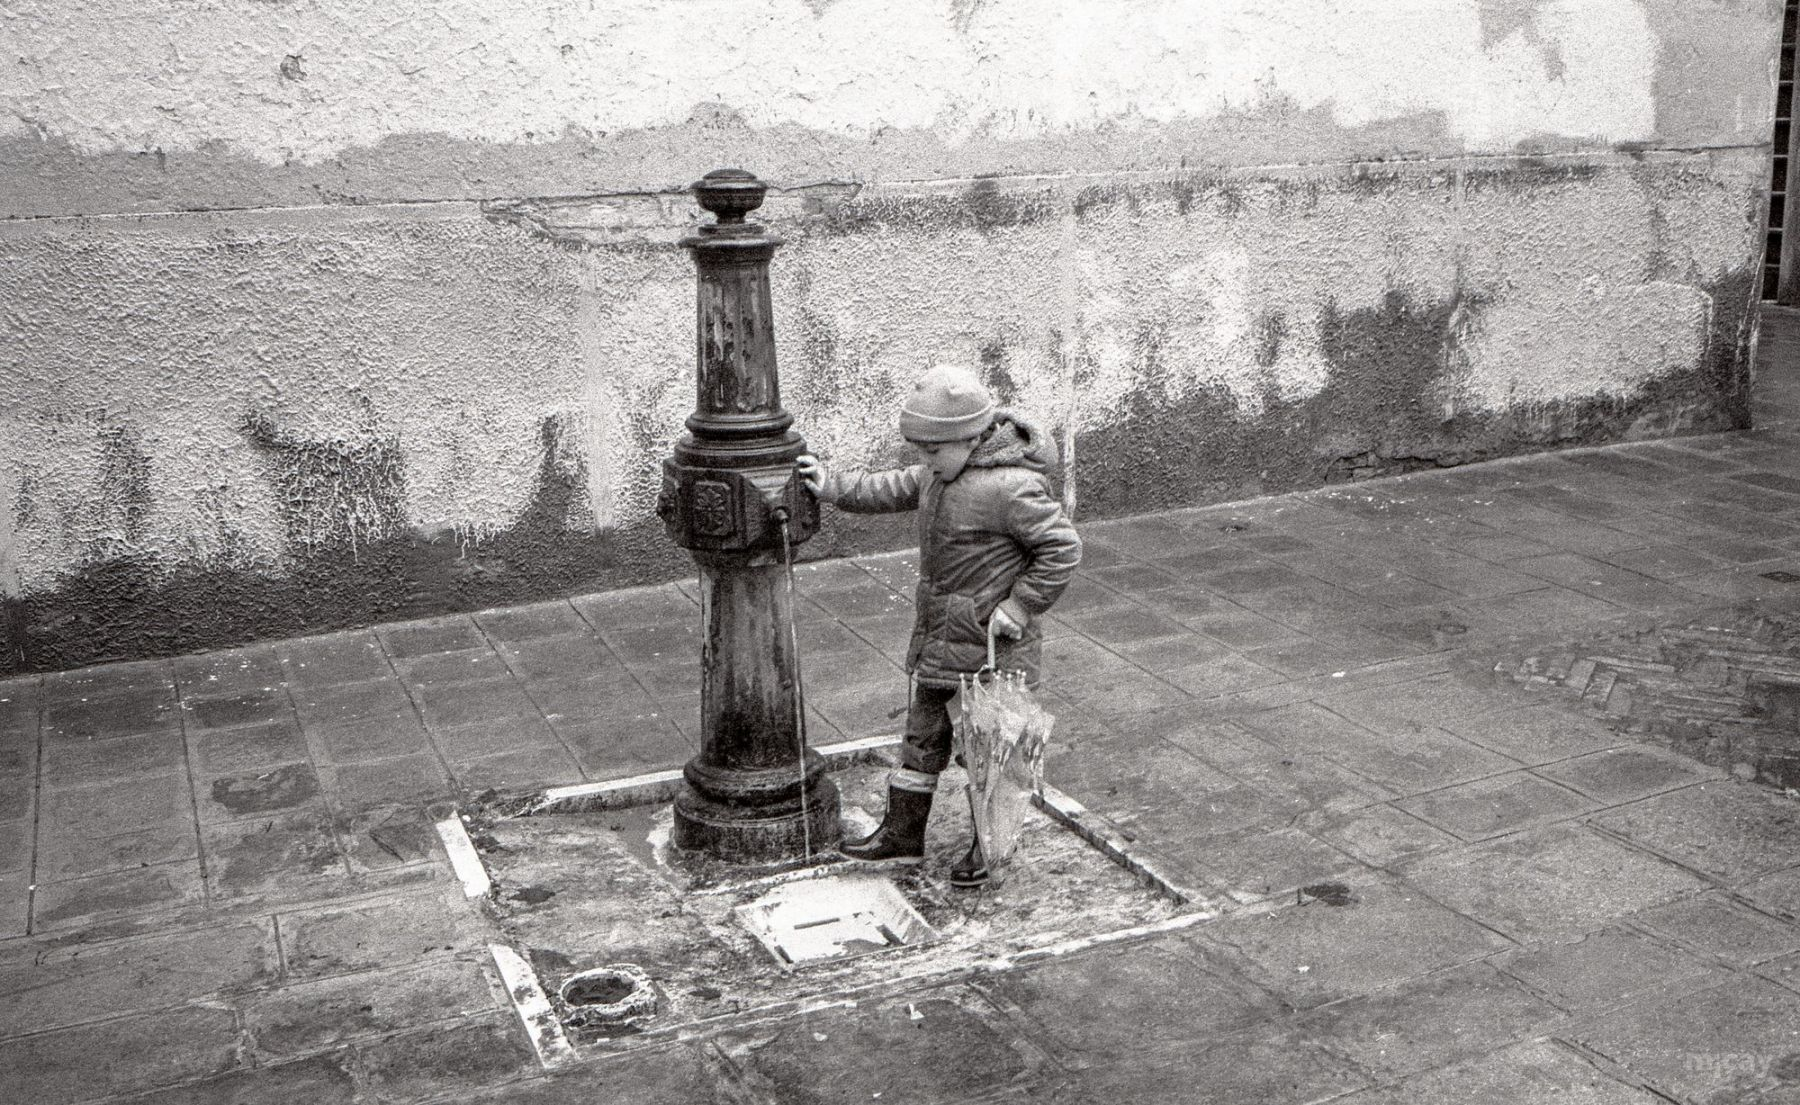 MichelAycaguer-Venise-AquaAlta-Noel-1981-20